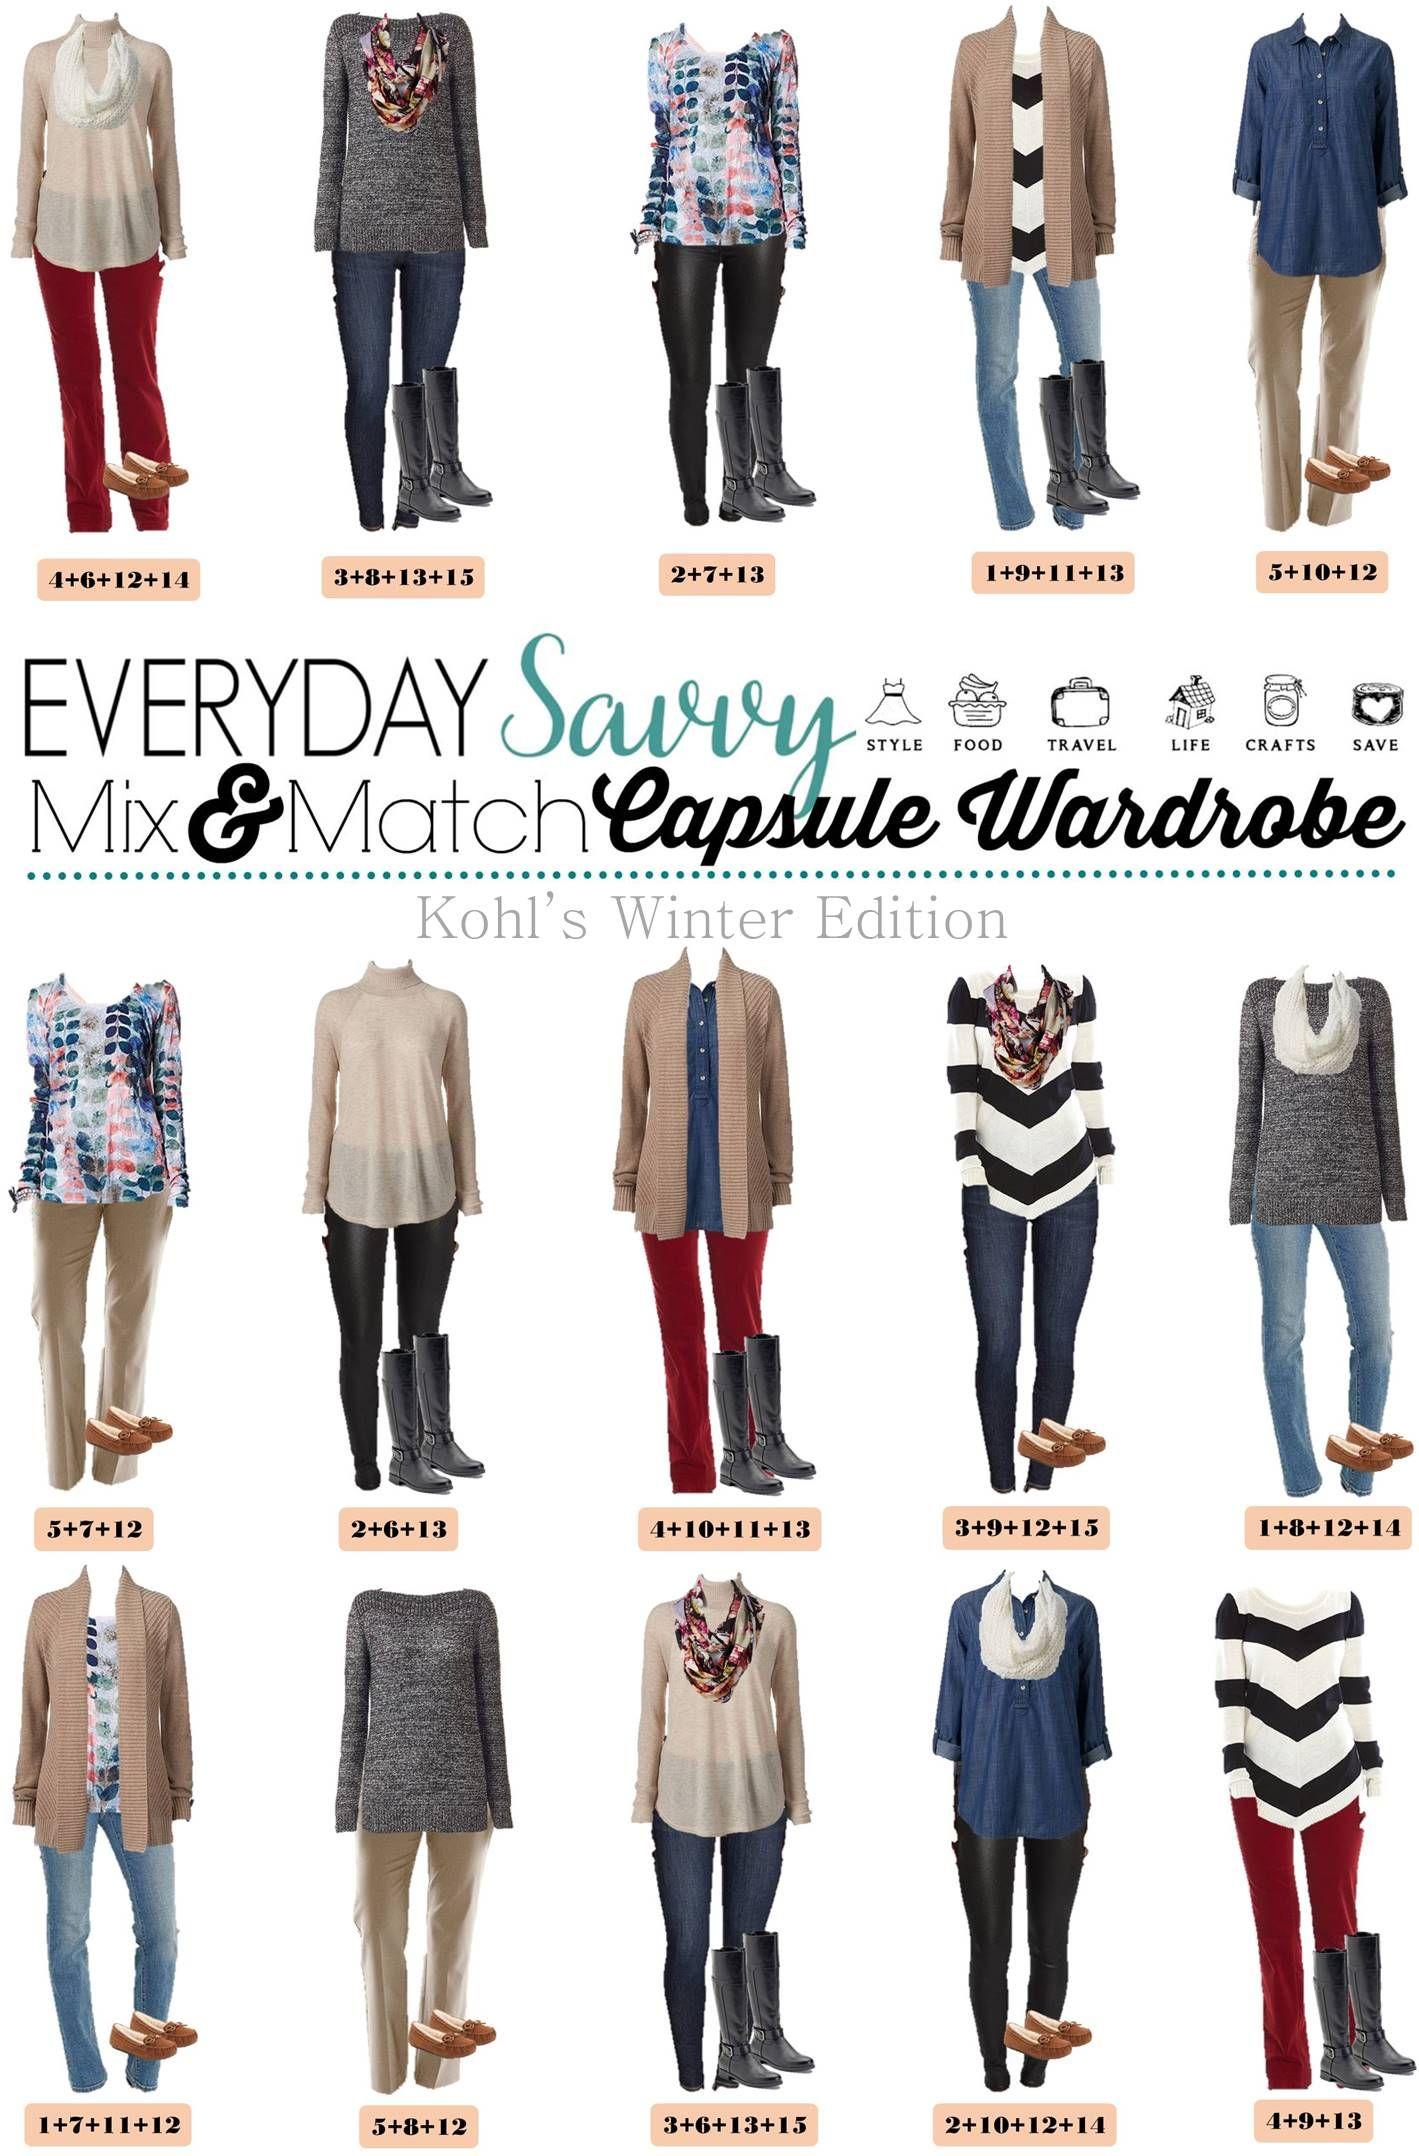 mix and match kohls winter capsule wardrobe capsule